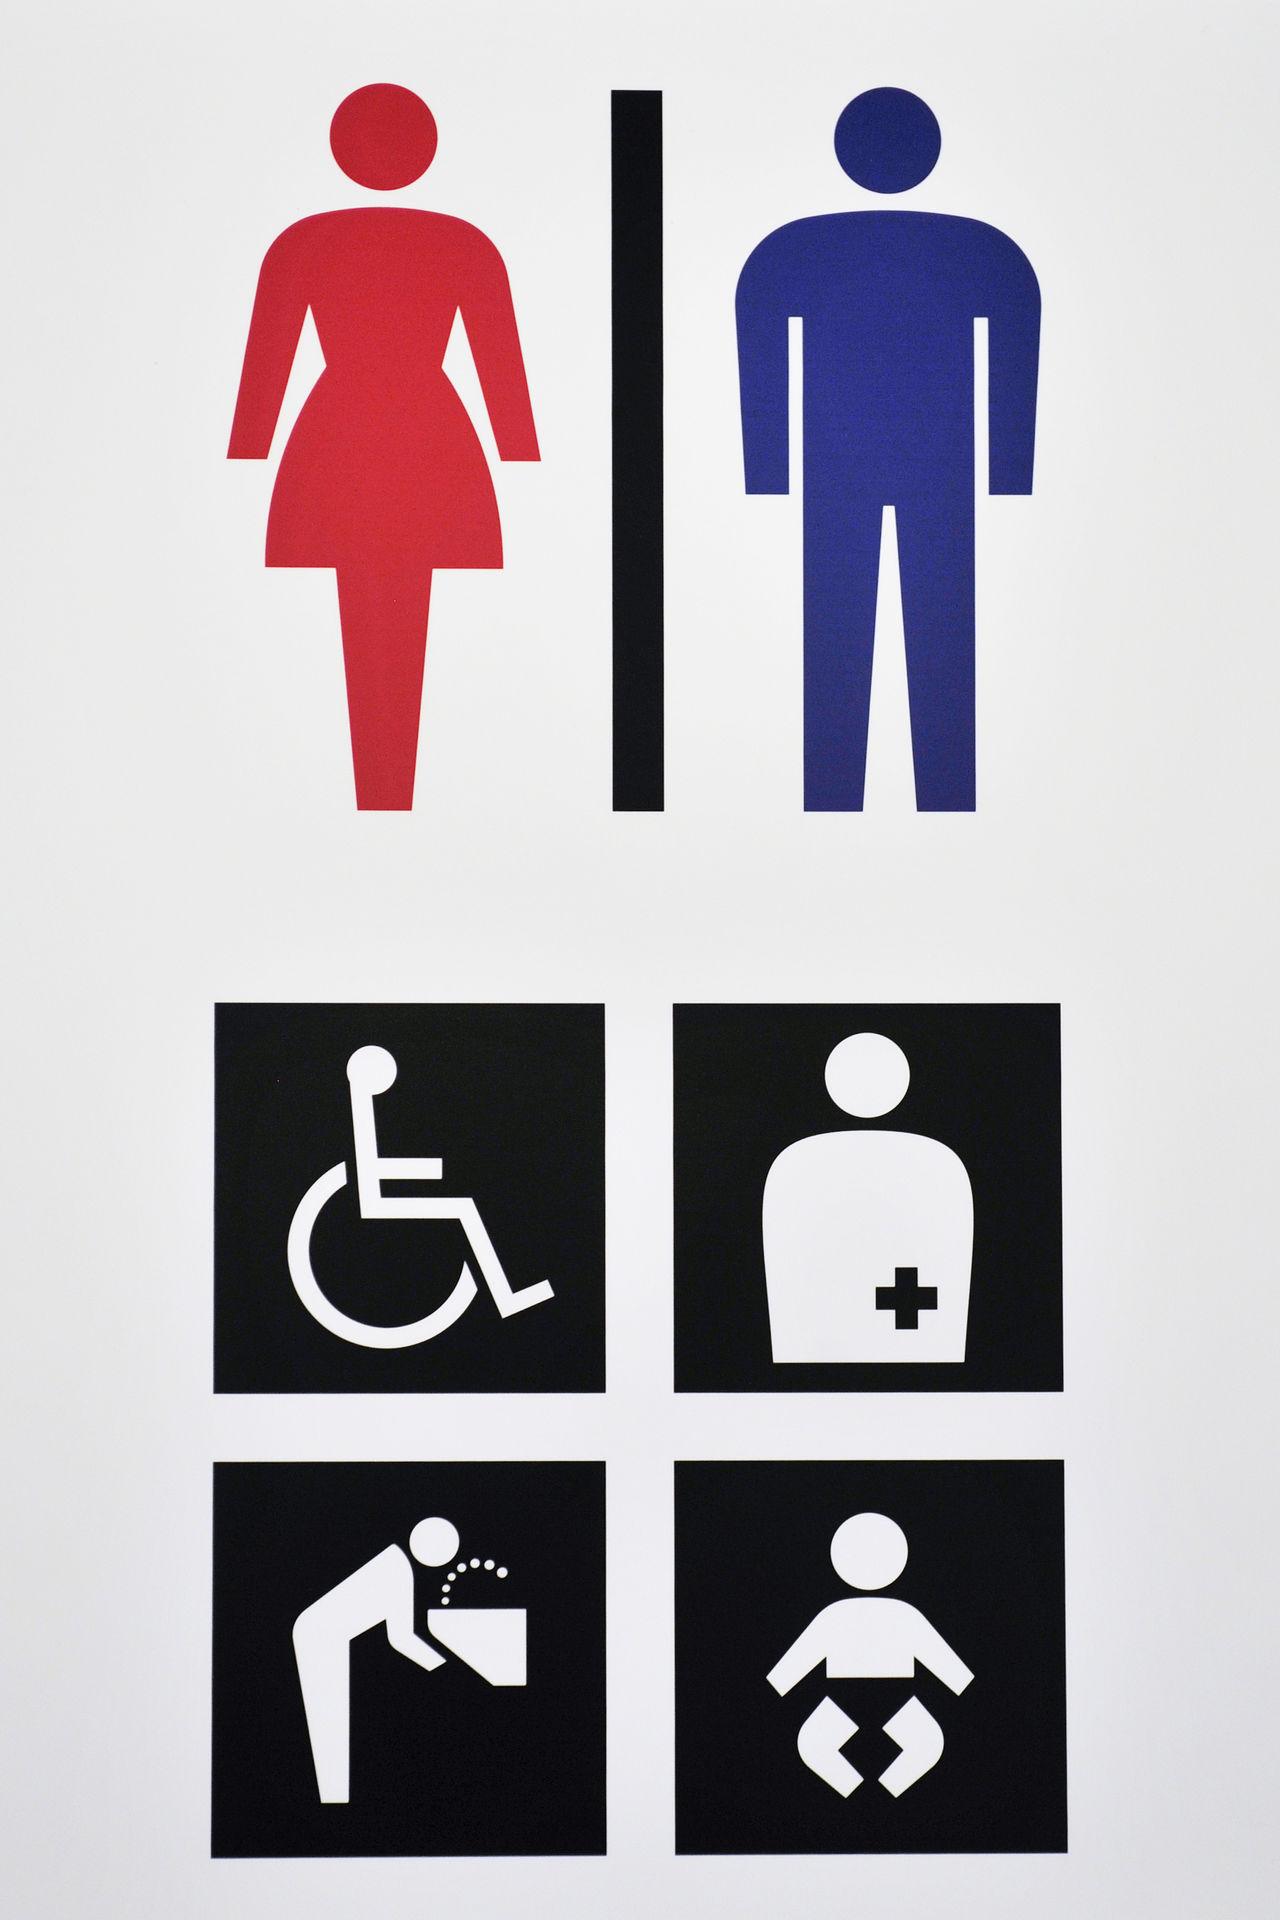 Japan S Toilet Signage Goes Global Nippon Com